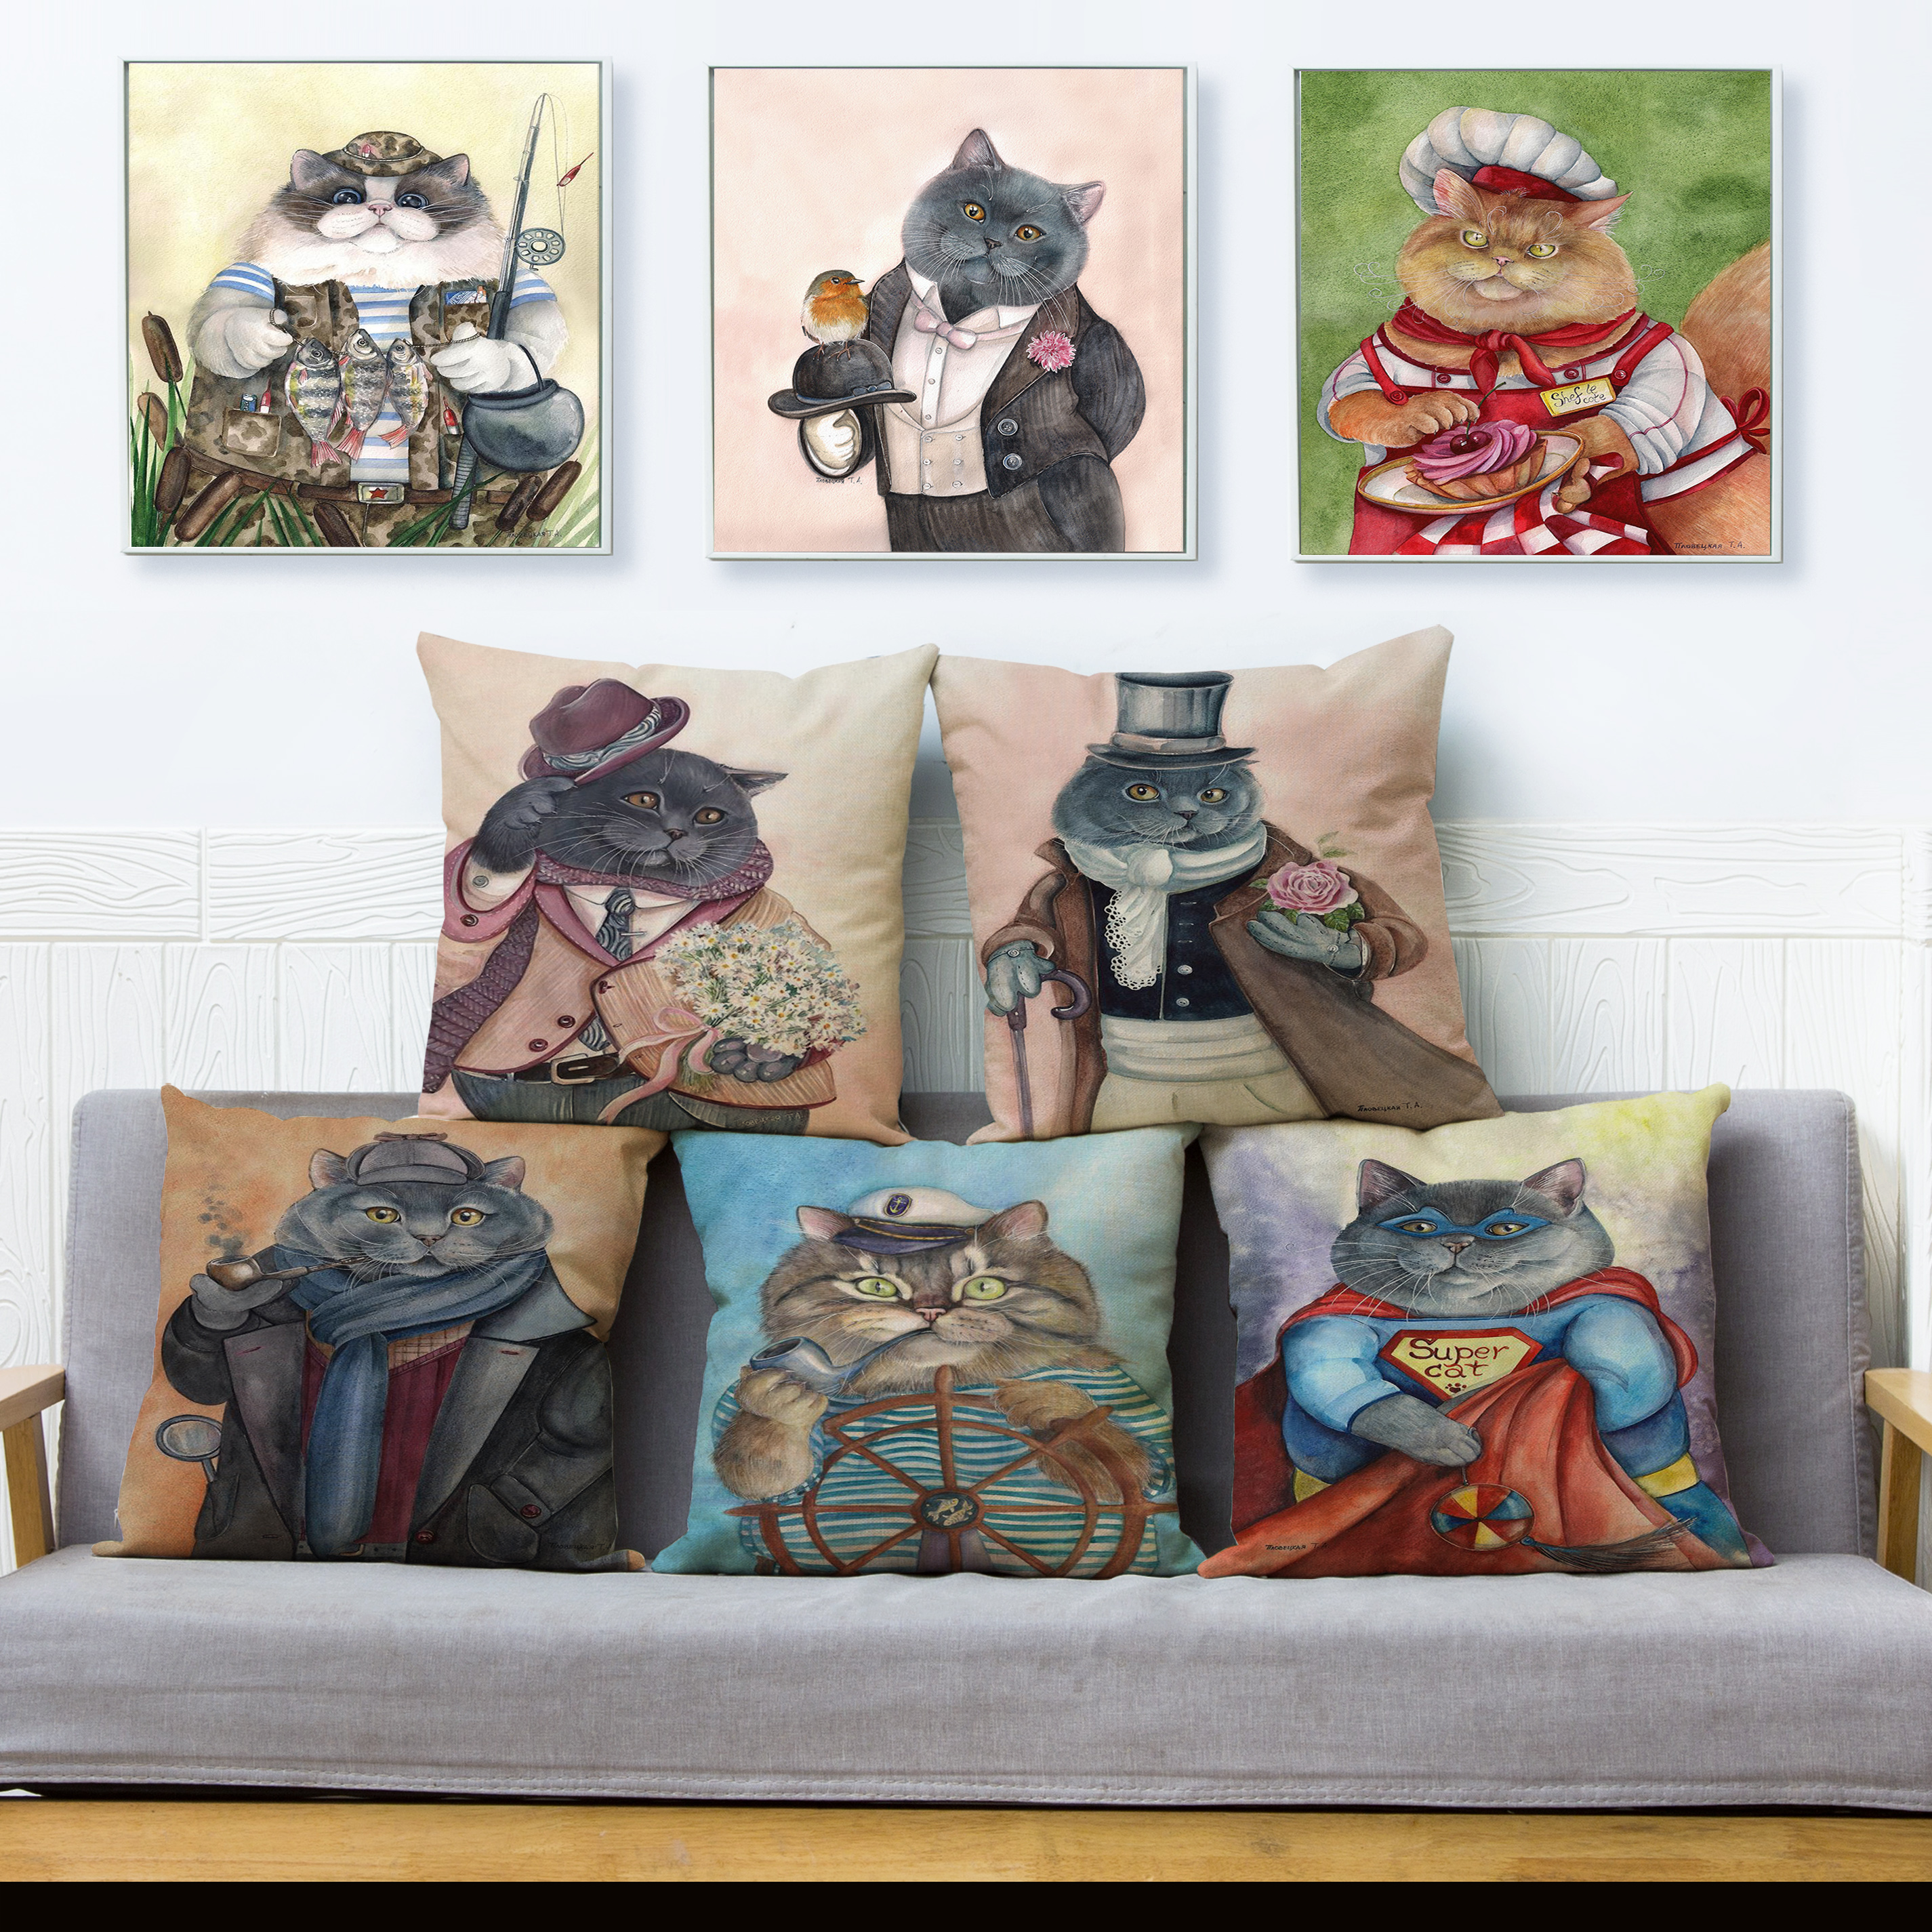 12 Styles Cartoon Cats Print Cushion Cover Custom 45*45cm Linen Pillow Covers Throw Pillows Cases Sofa Home Decor Pillowcase